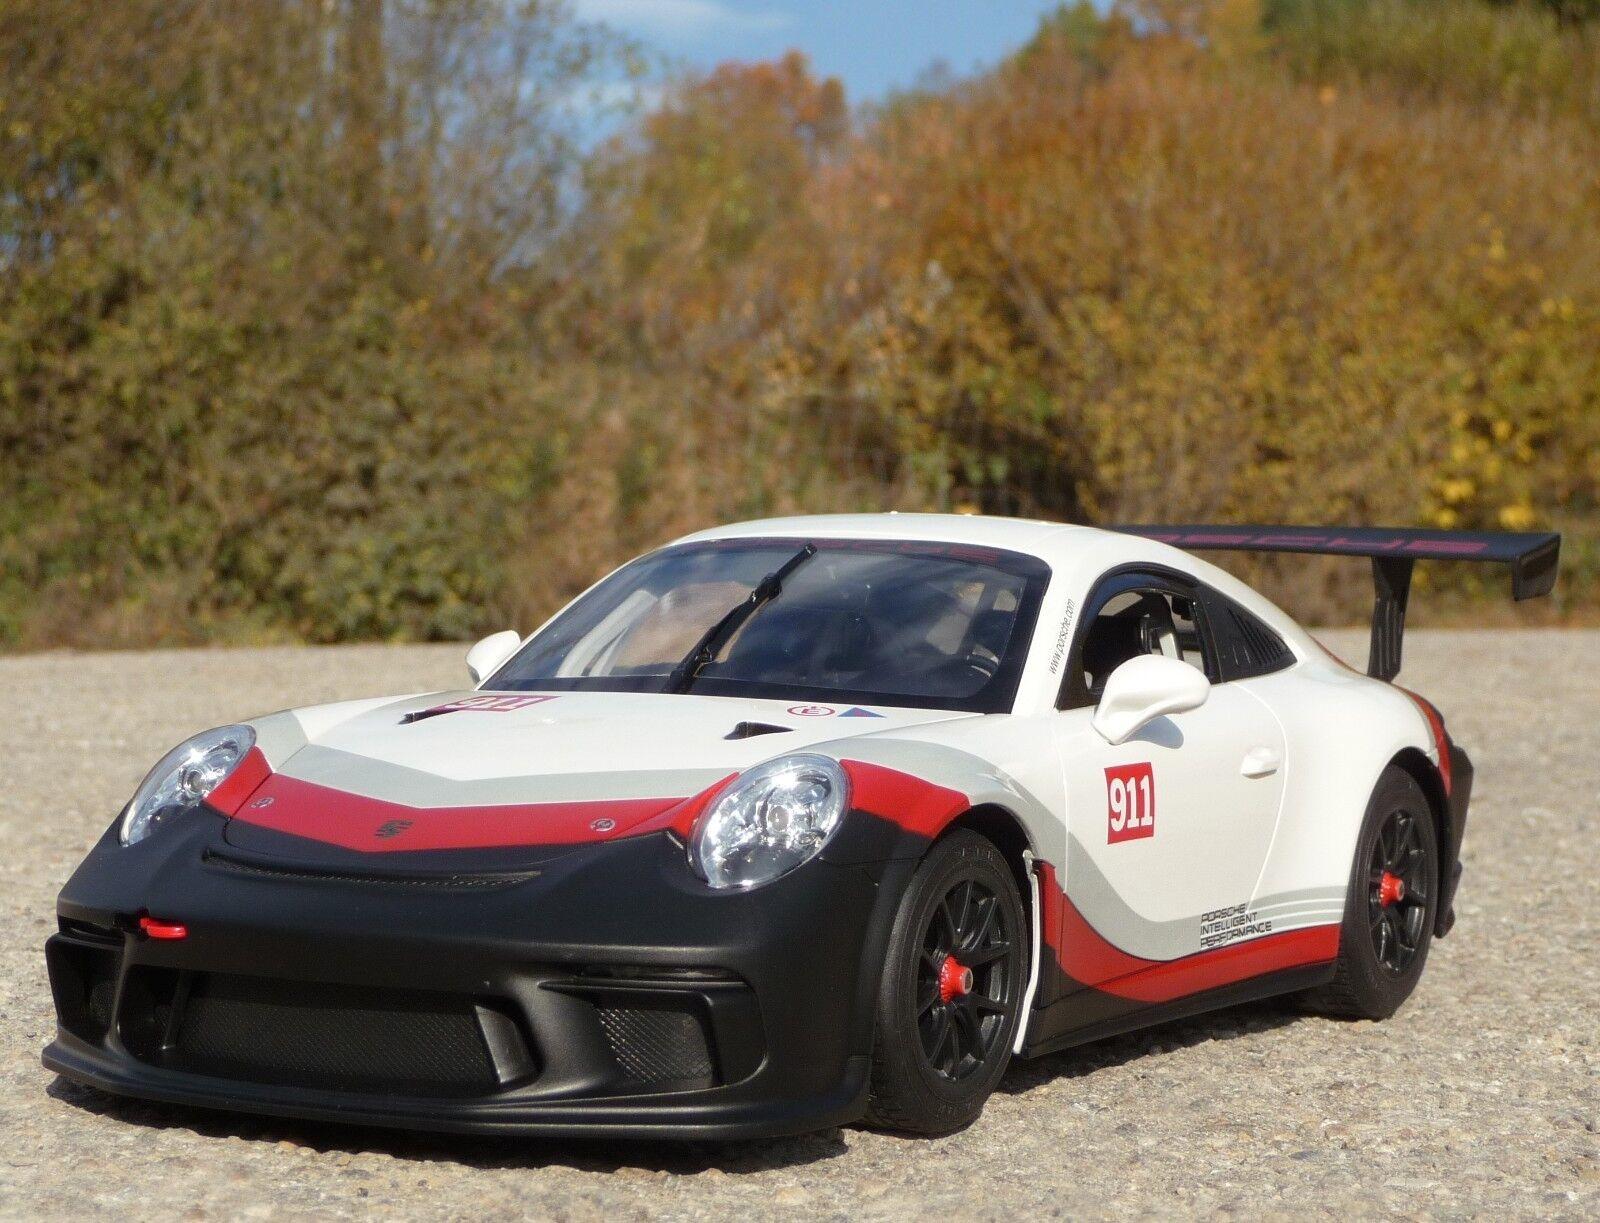 RC Porsche 911 - 991 gt3 RACING CON LUCE lunghezza 32cm da postazione remota 27mhz 405153